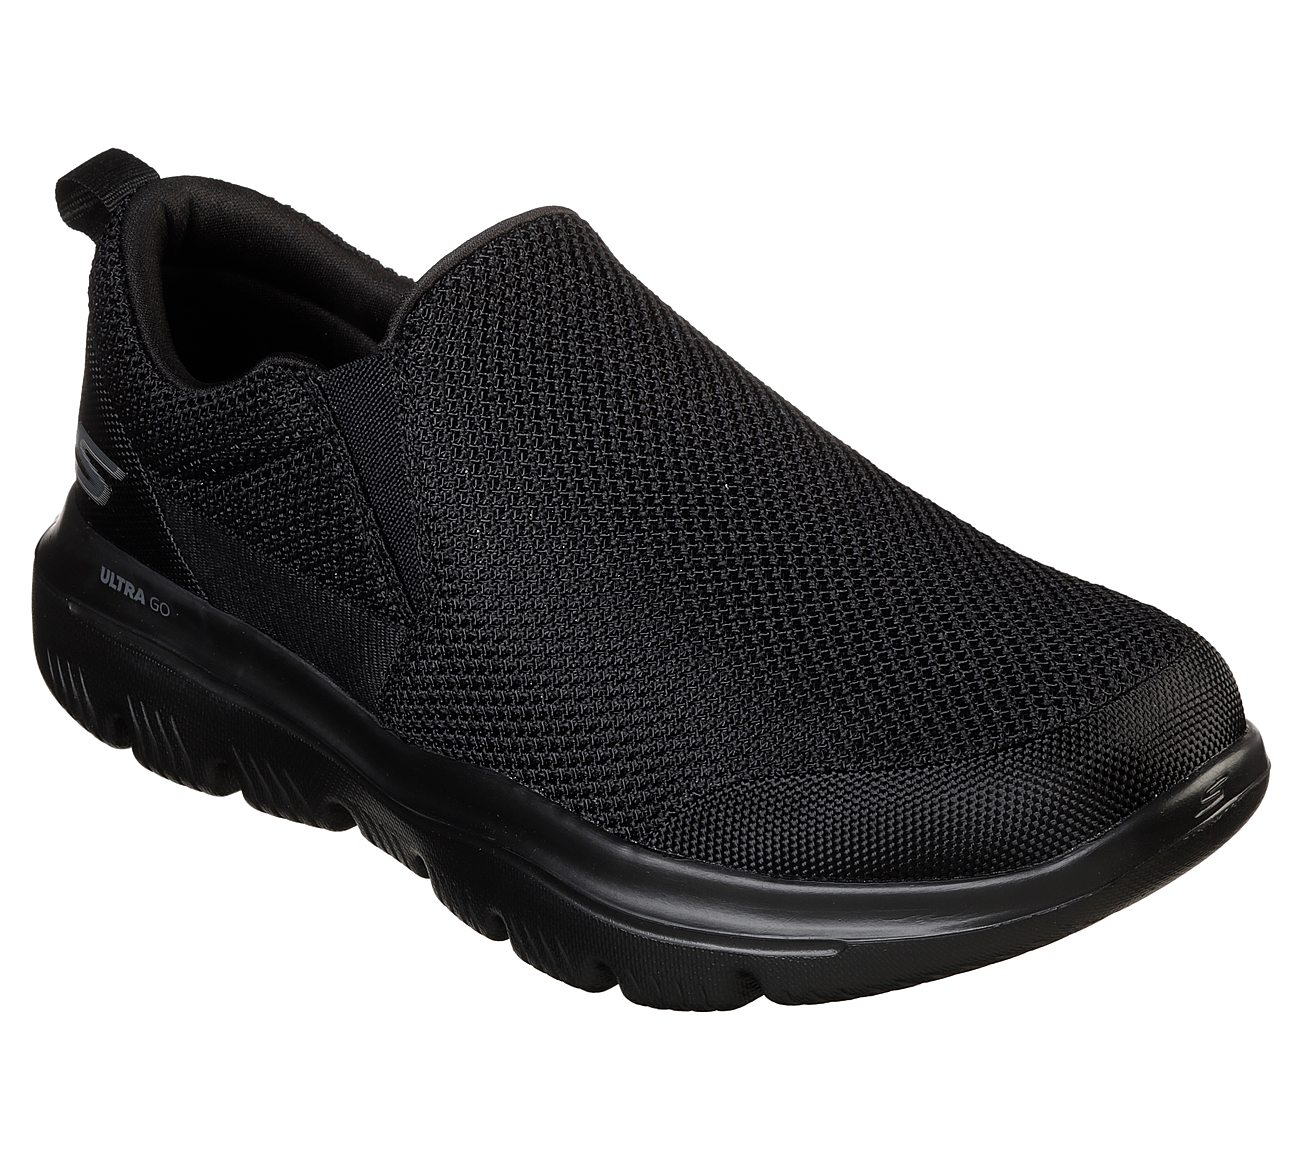 divorcio voltaje giratorio  Buy SKECHERS Skechers GOwalk Evolution Ultra - Impeccable Skechers  Performance Shoes